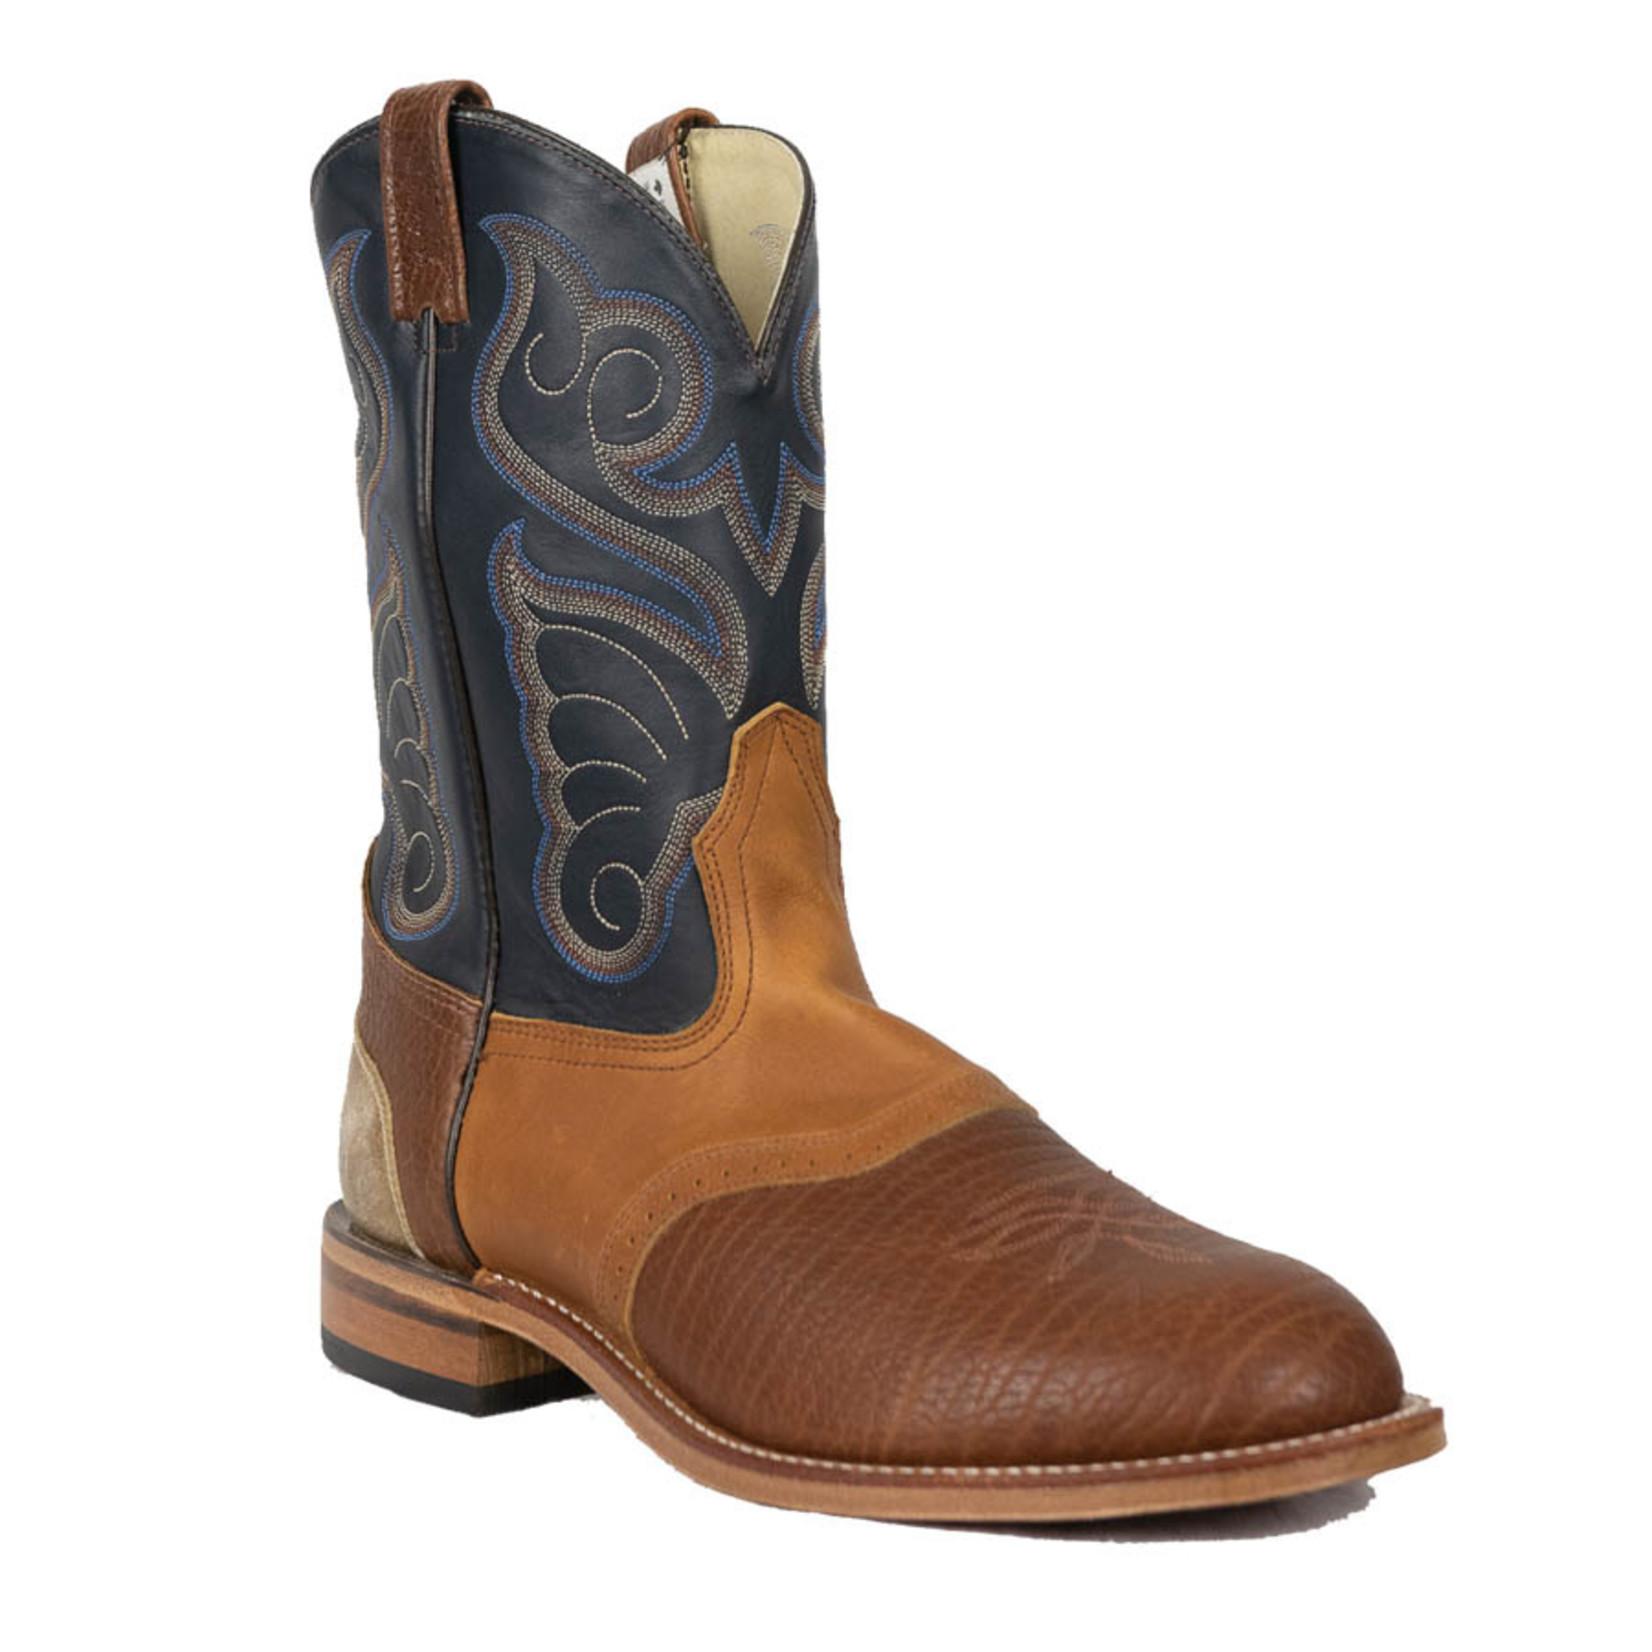 Canada West Canada West Brahma Men's Cowboy Boot 77659 3E